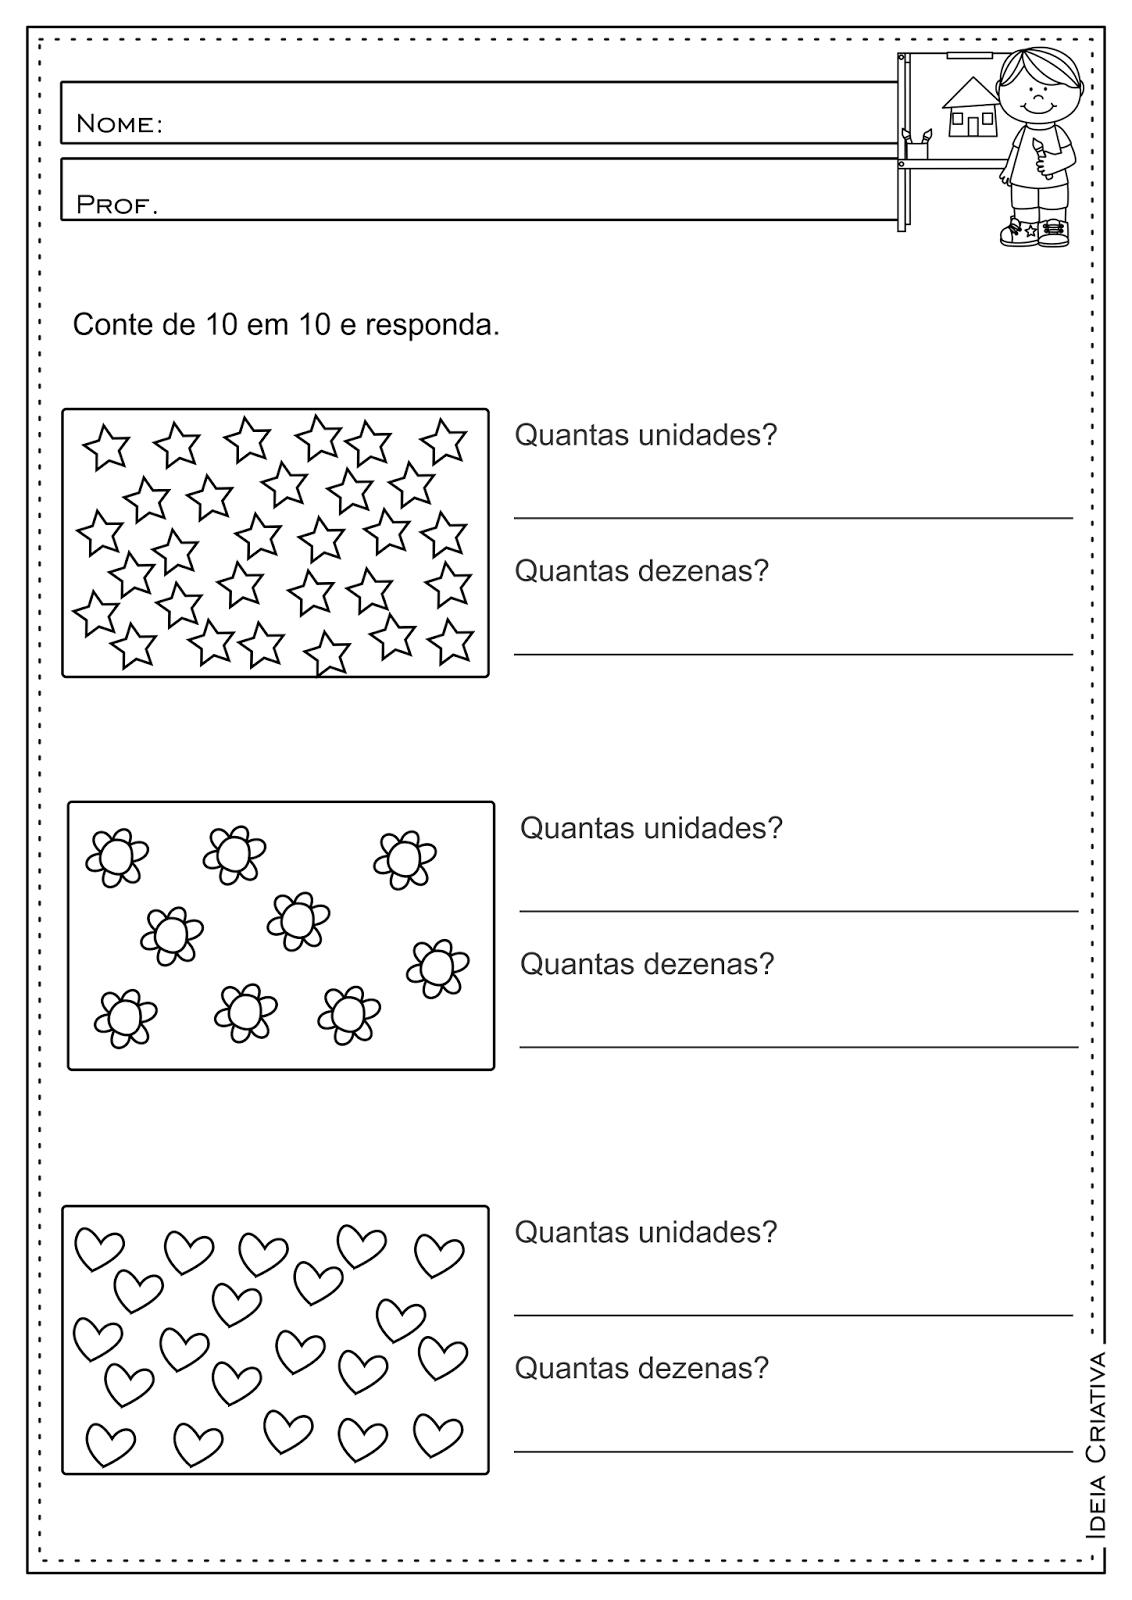 Atividades educativas Matemática Dezena e Unidade e Sinais de Maior que e Menor que para Ensino Fundamental